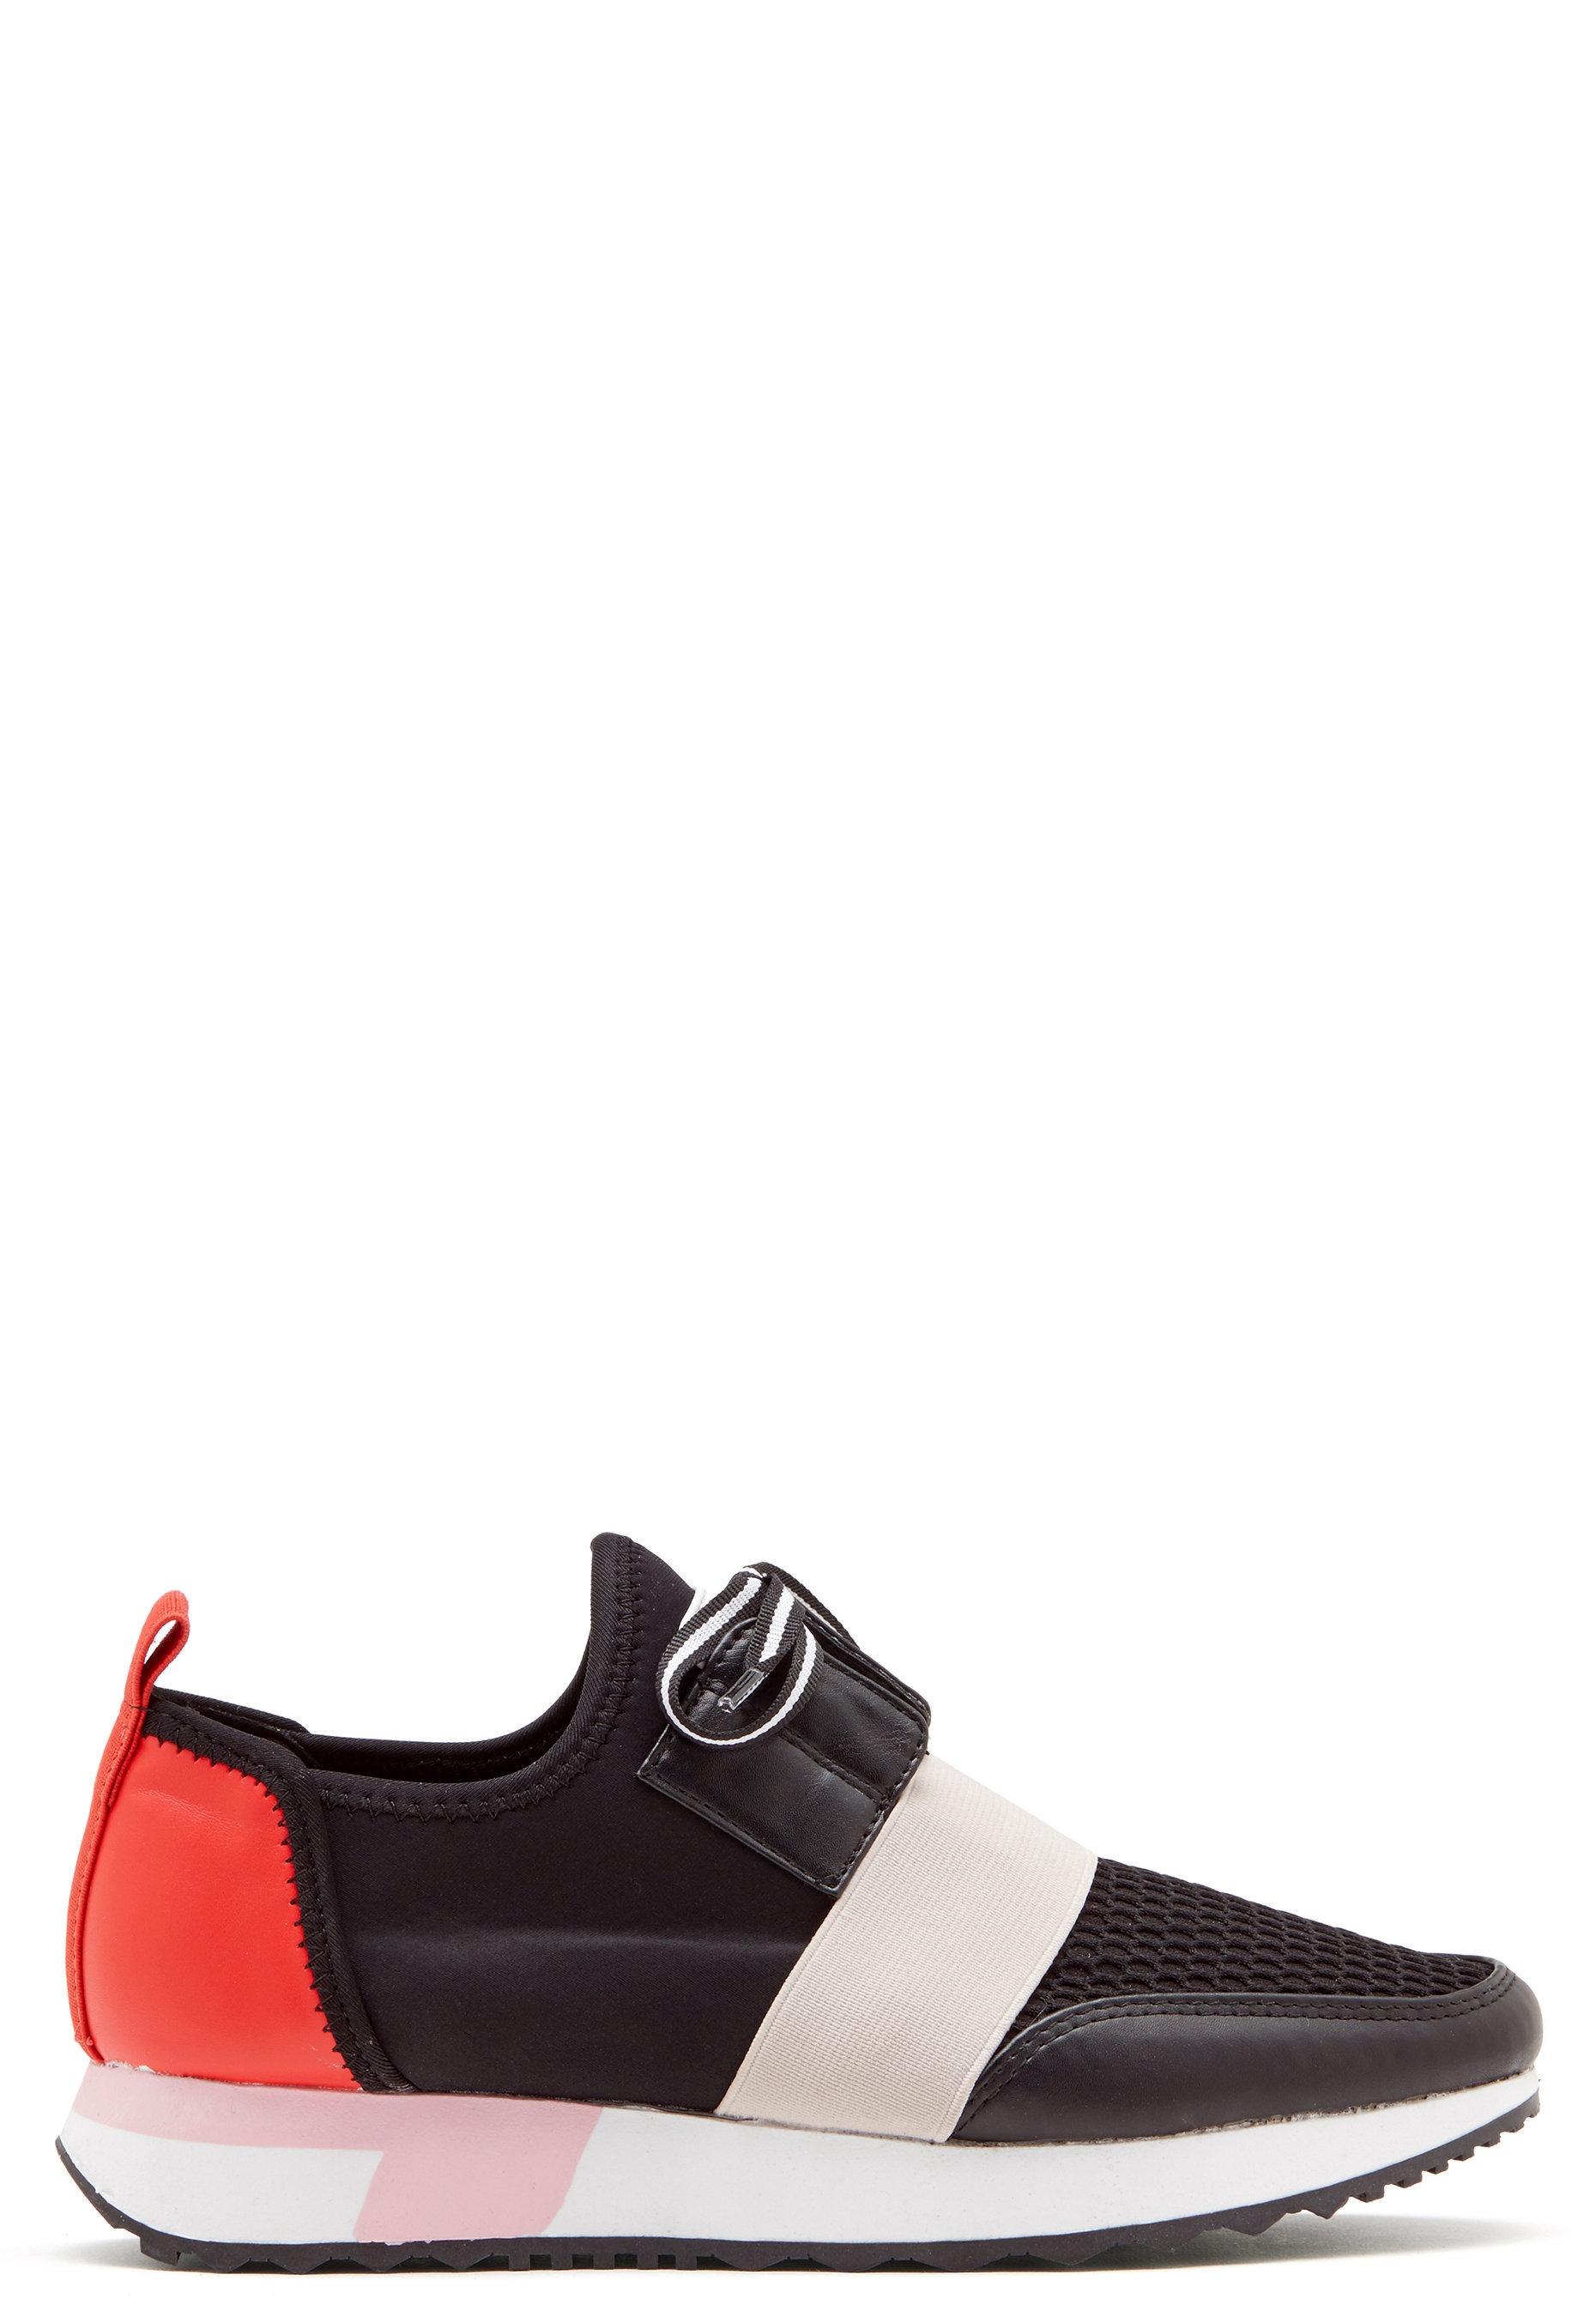 9703492a Steve Madden Antics Sneakers Black Multi - Bubbleroom